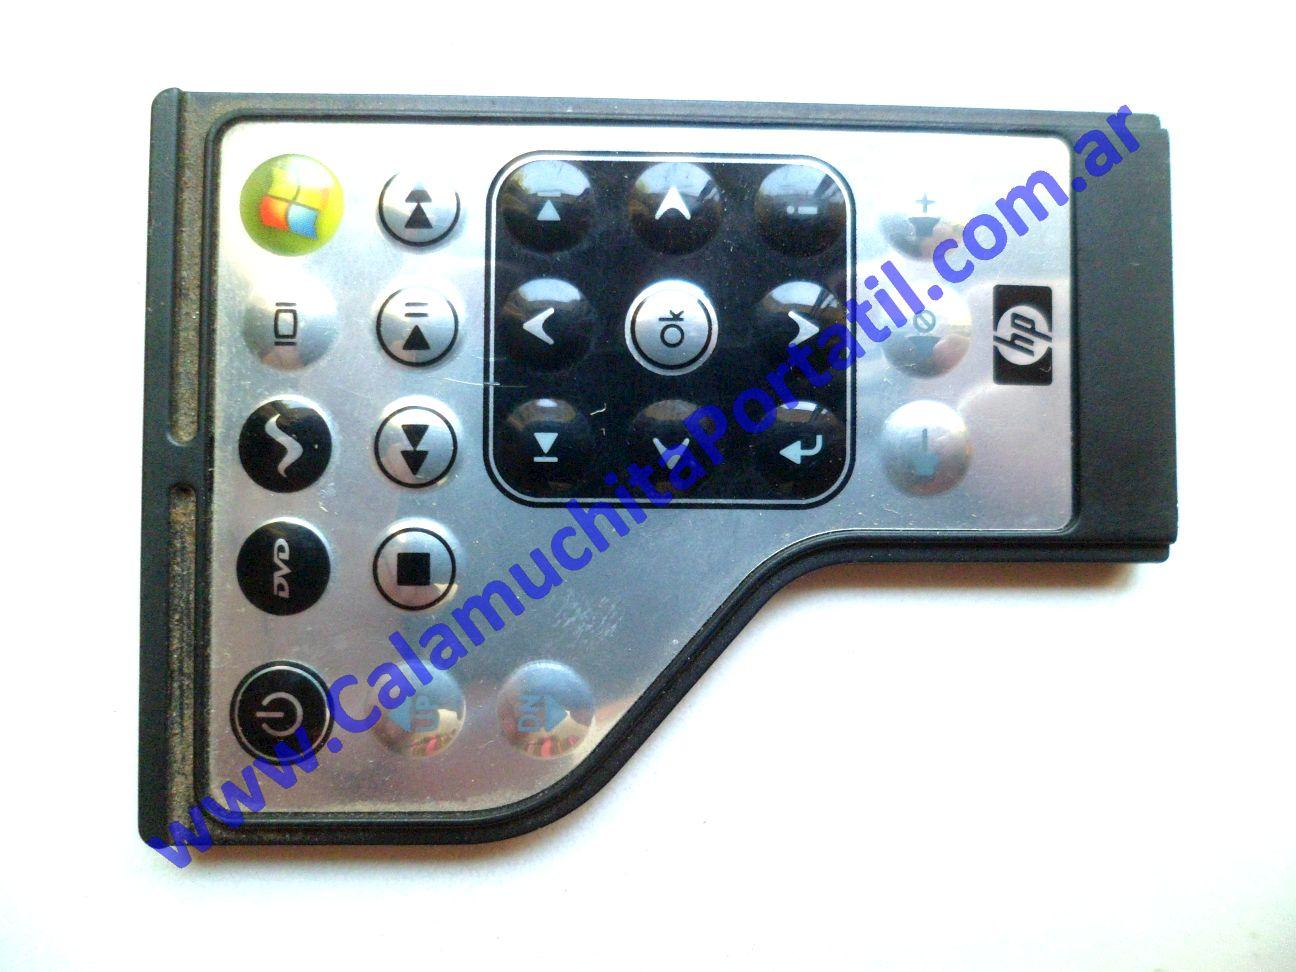 0330ACR Control Remoto Hewlett Packard Pavilion dv4-2013la / VS604LA#AC8